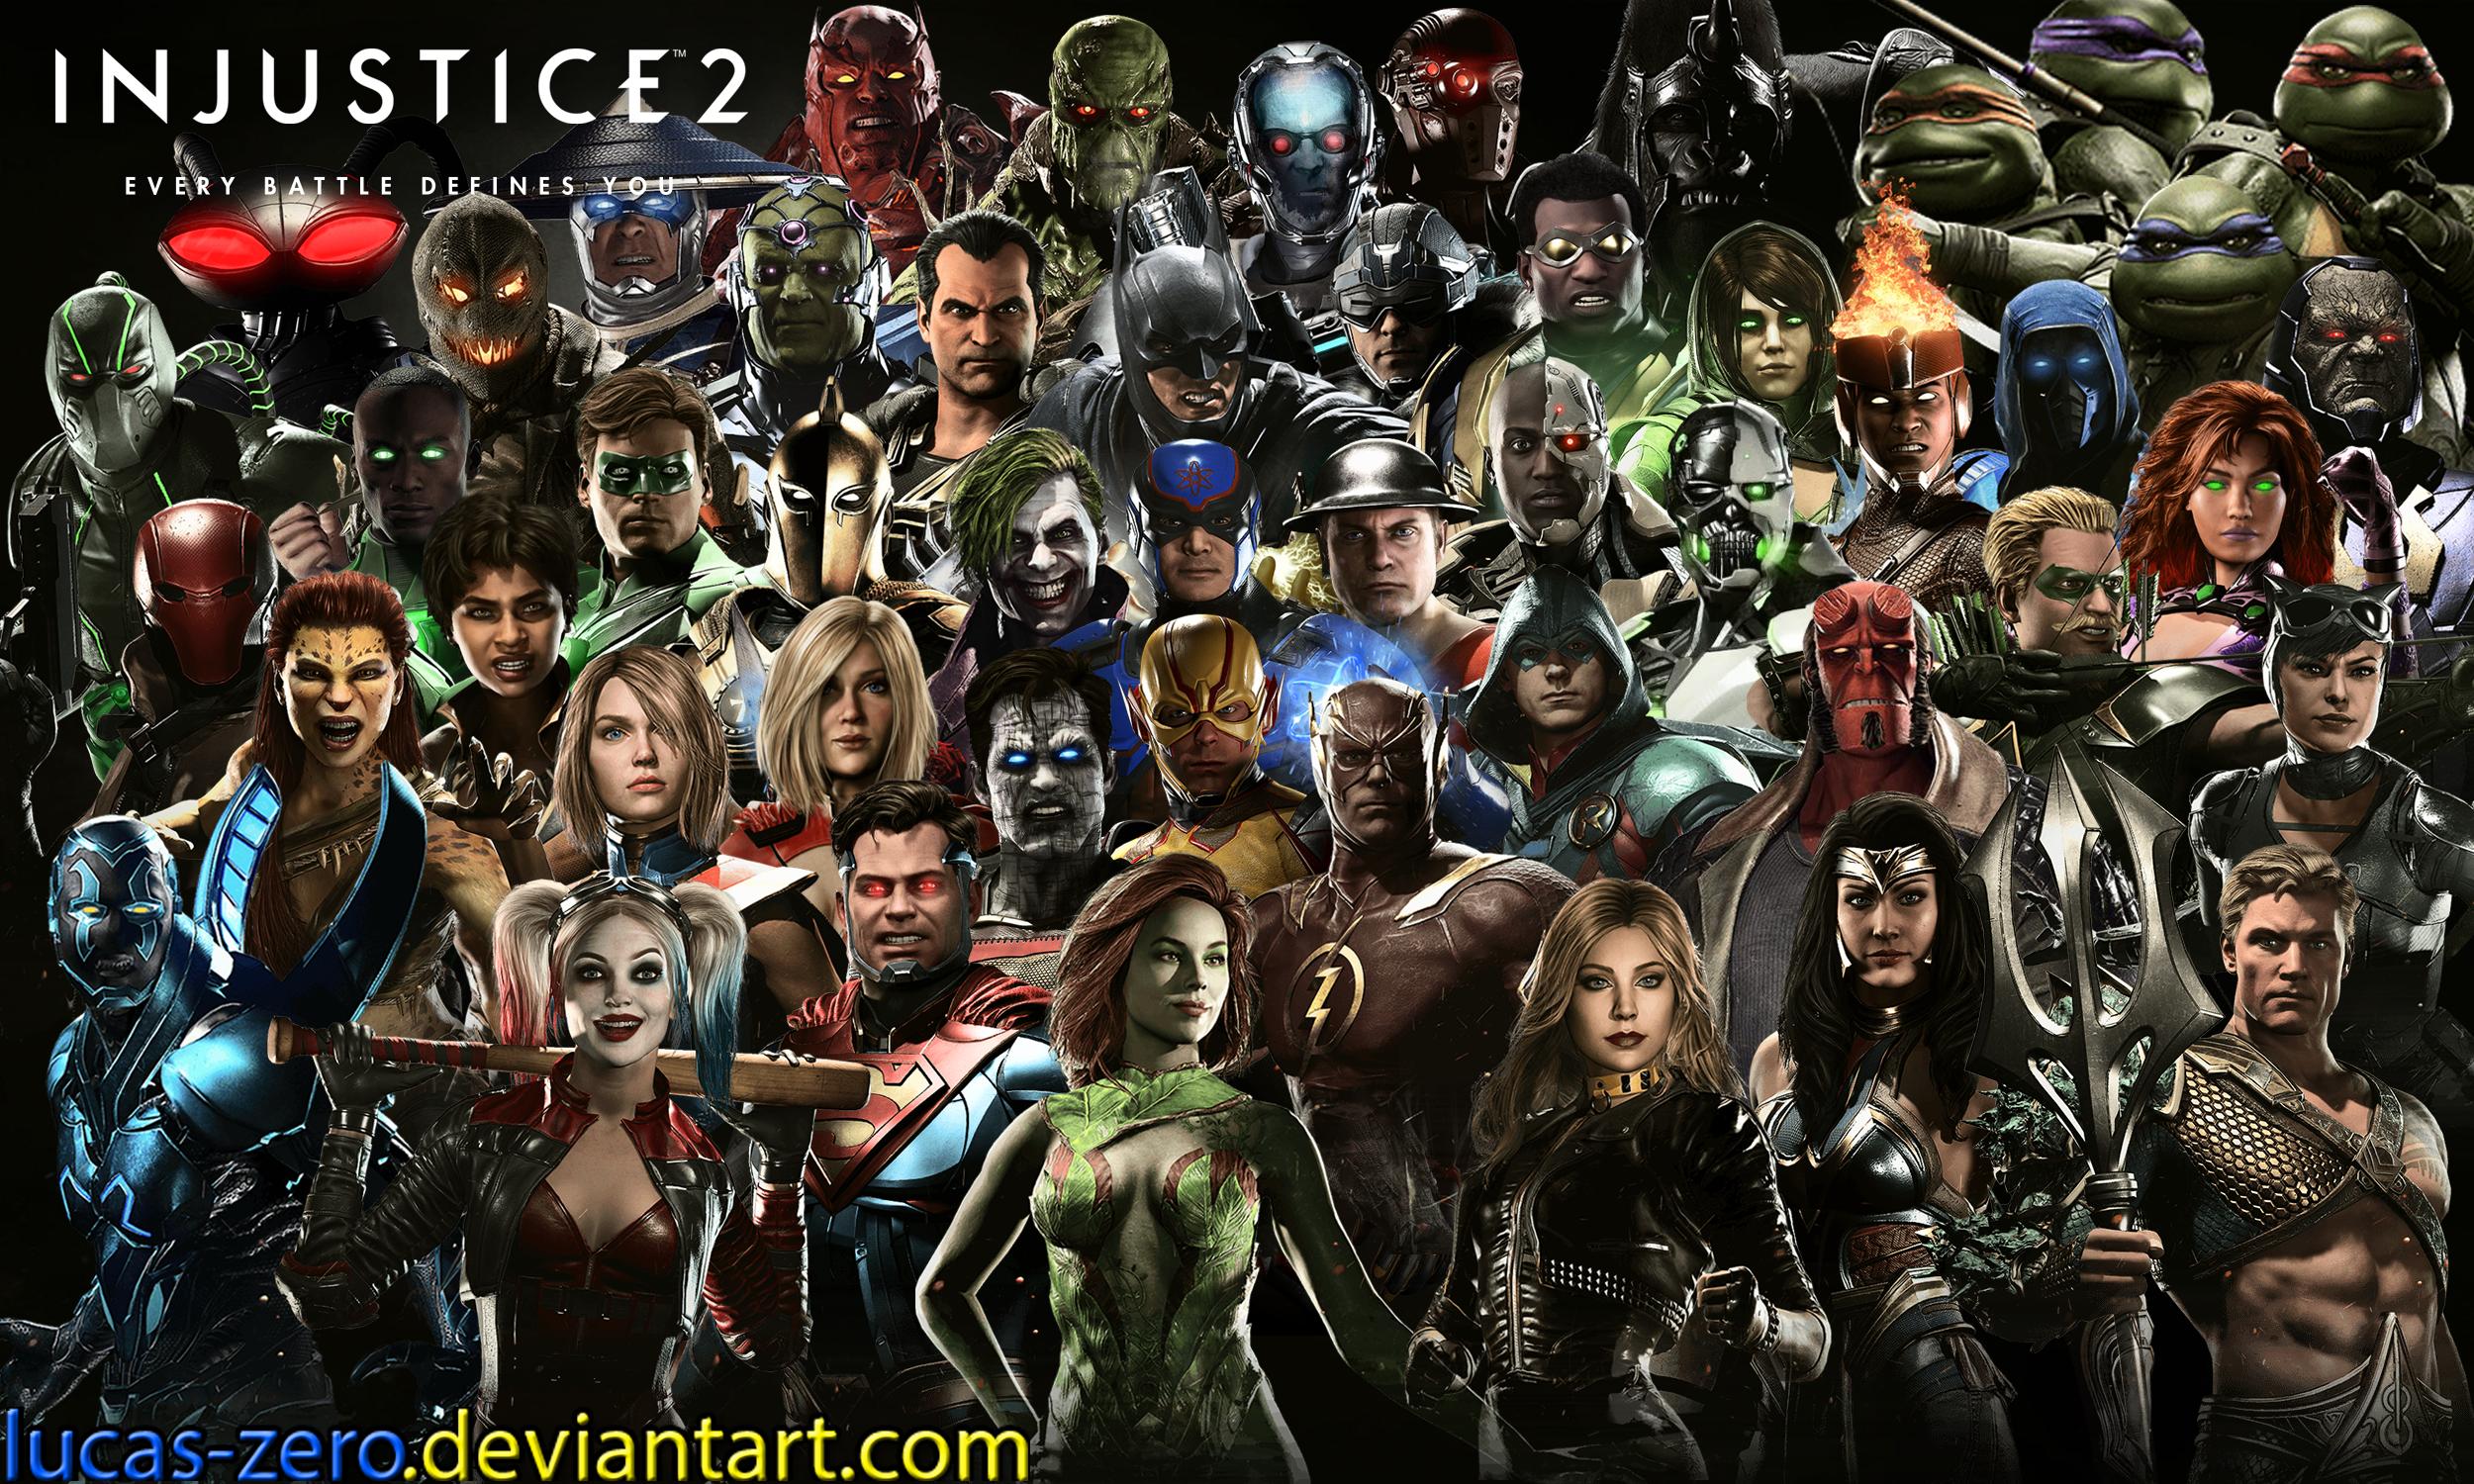 Injustice 2 Wallpaper By Lucas Zero On Deviantart